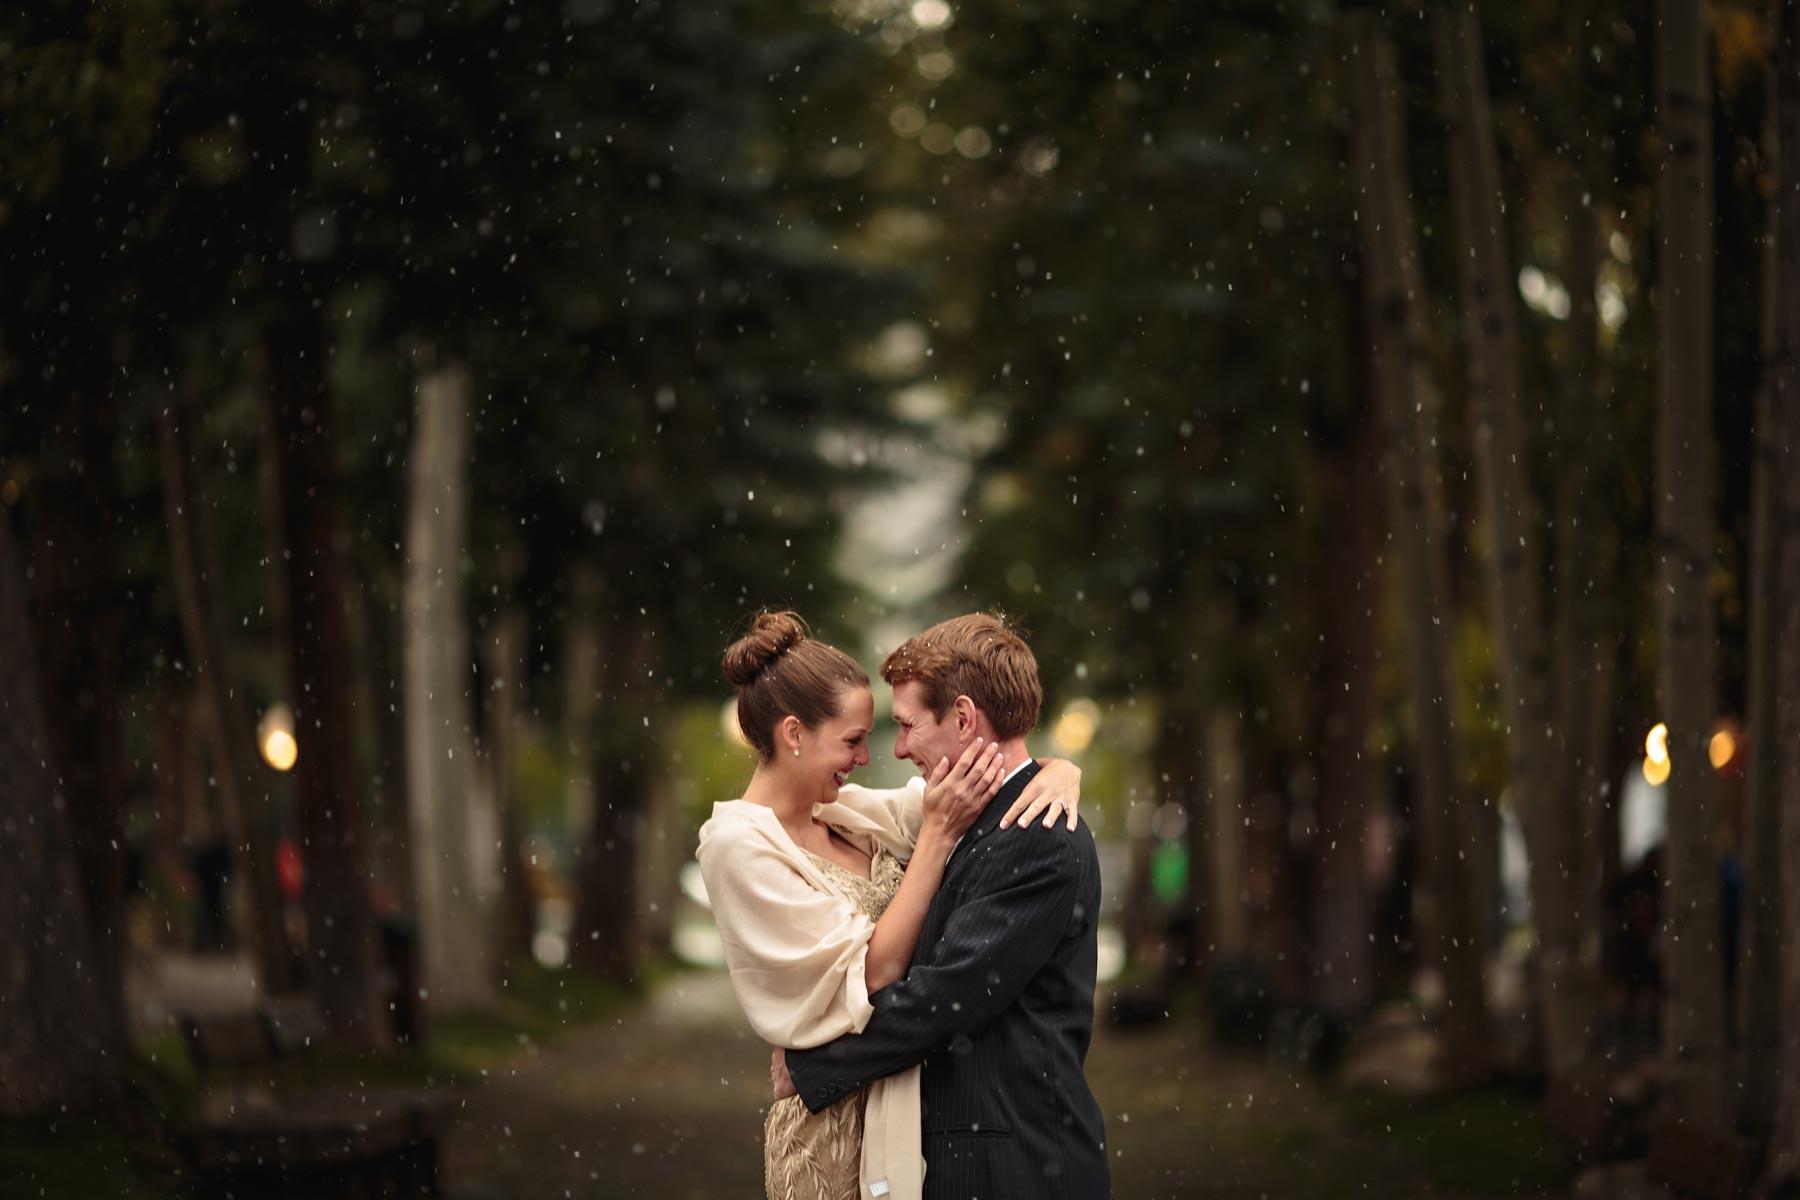 c6d5f-top-wedding-photographers1.jpg